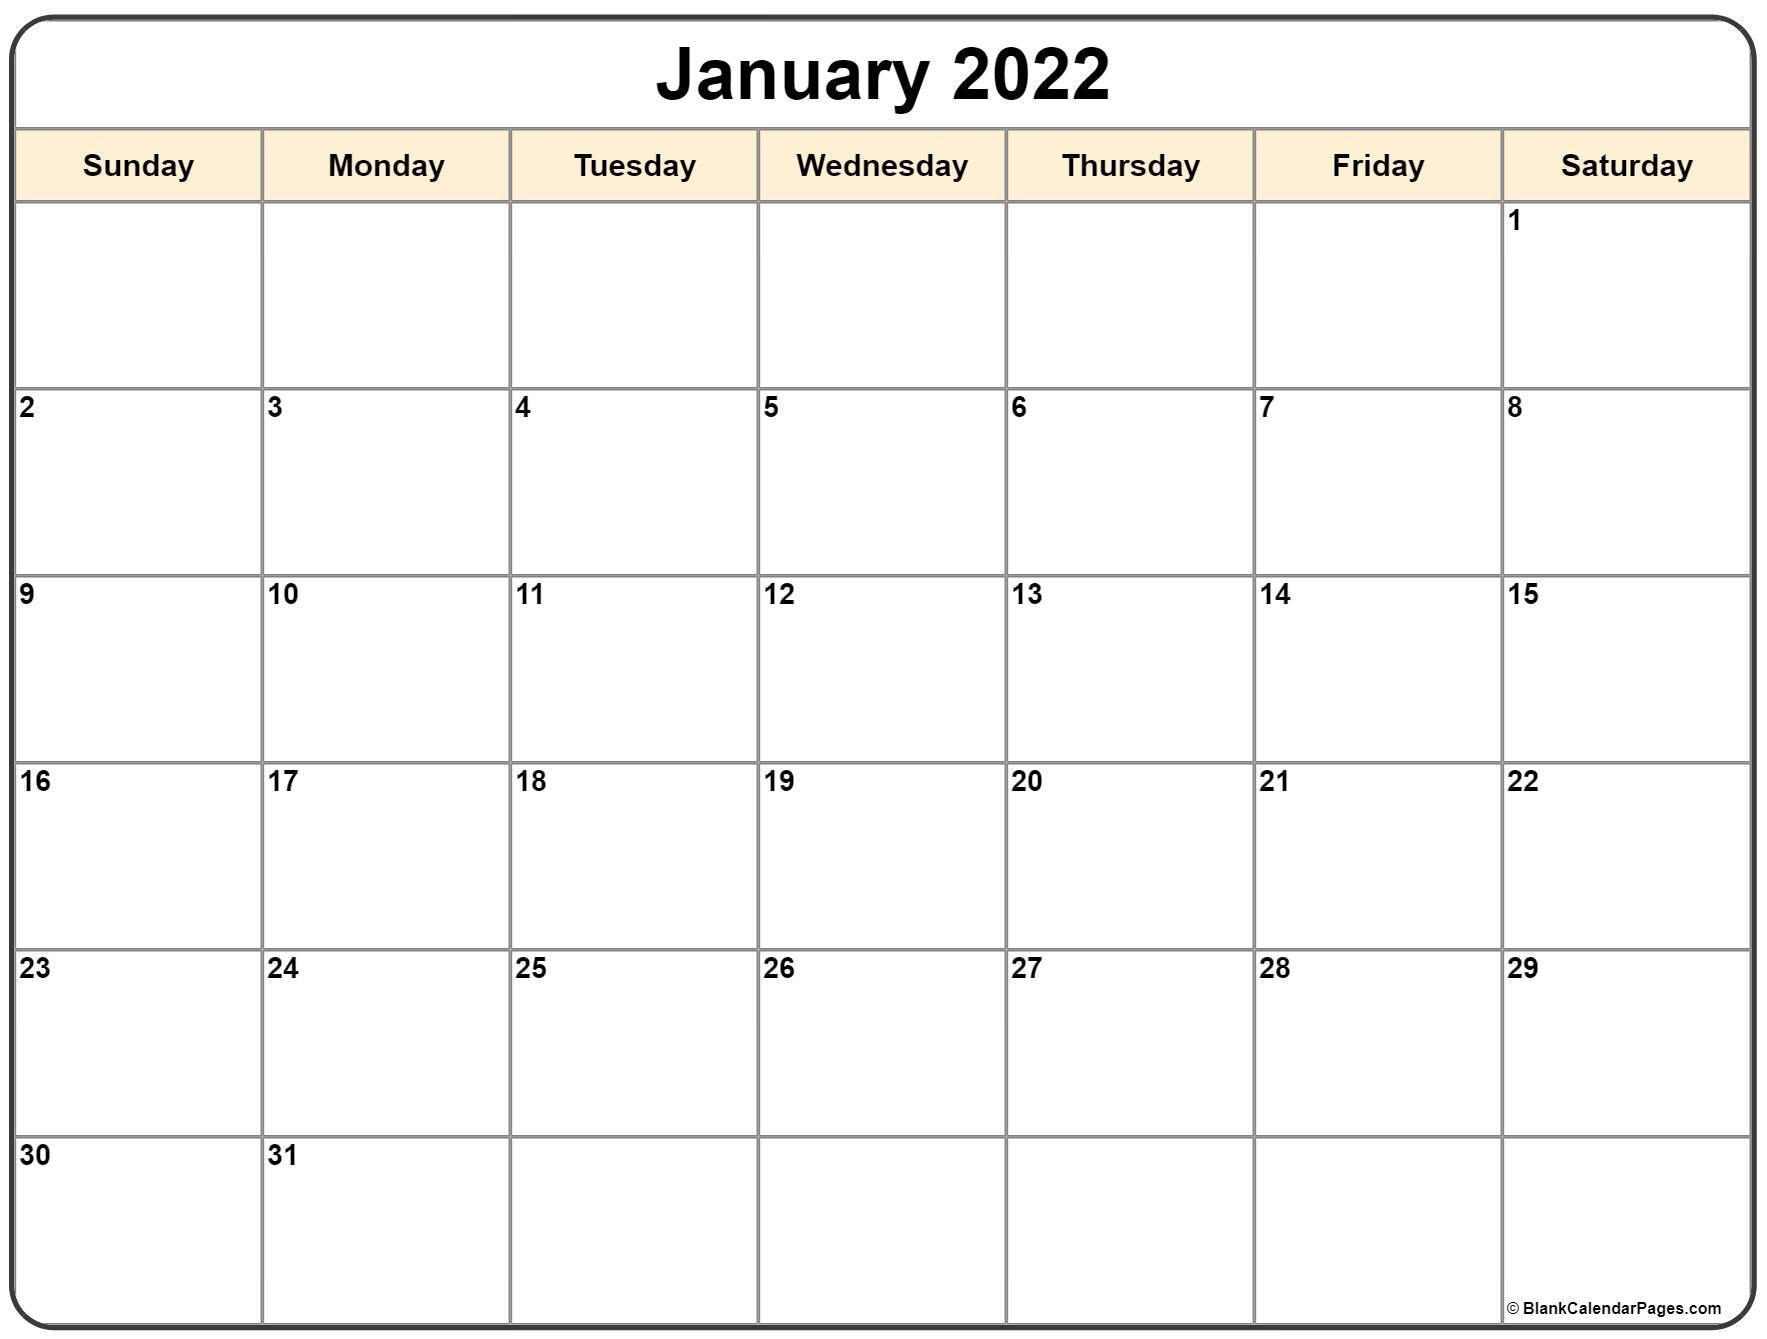 January 2022 Calendar | Free Printable Monthly Calendars With January2022 Printable Calendar Cute